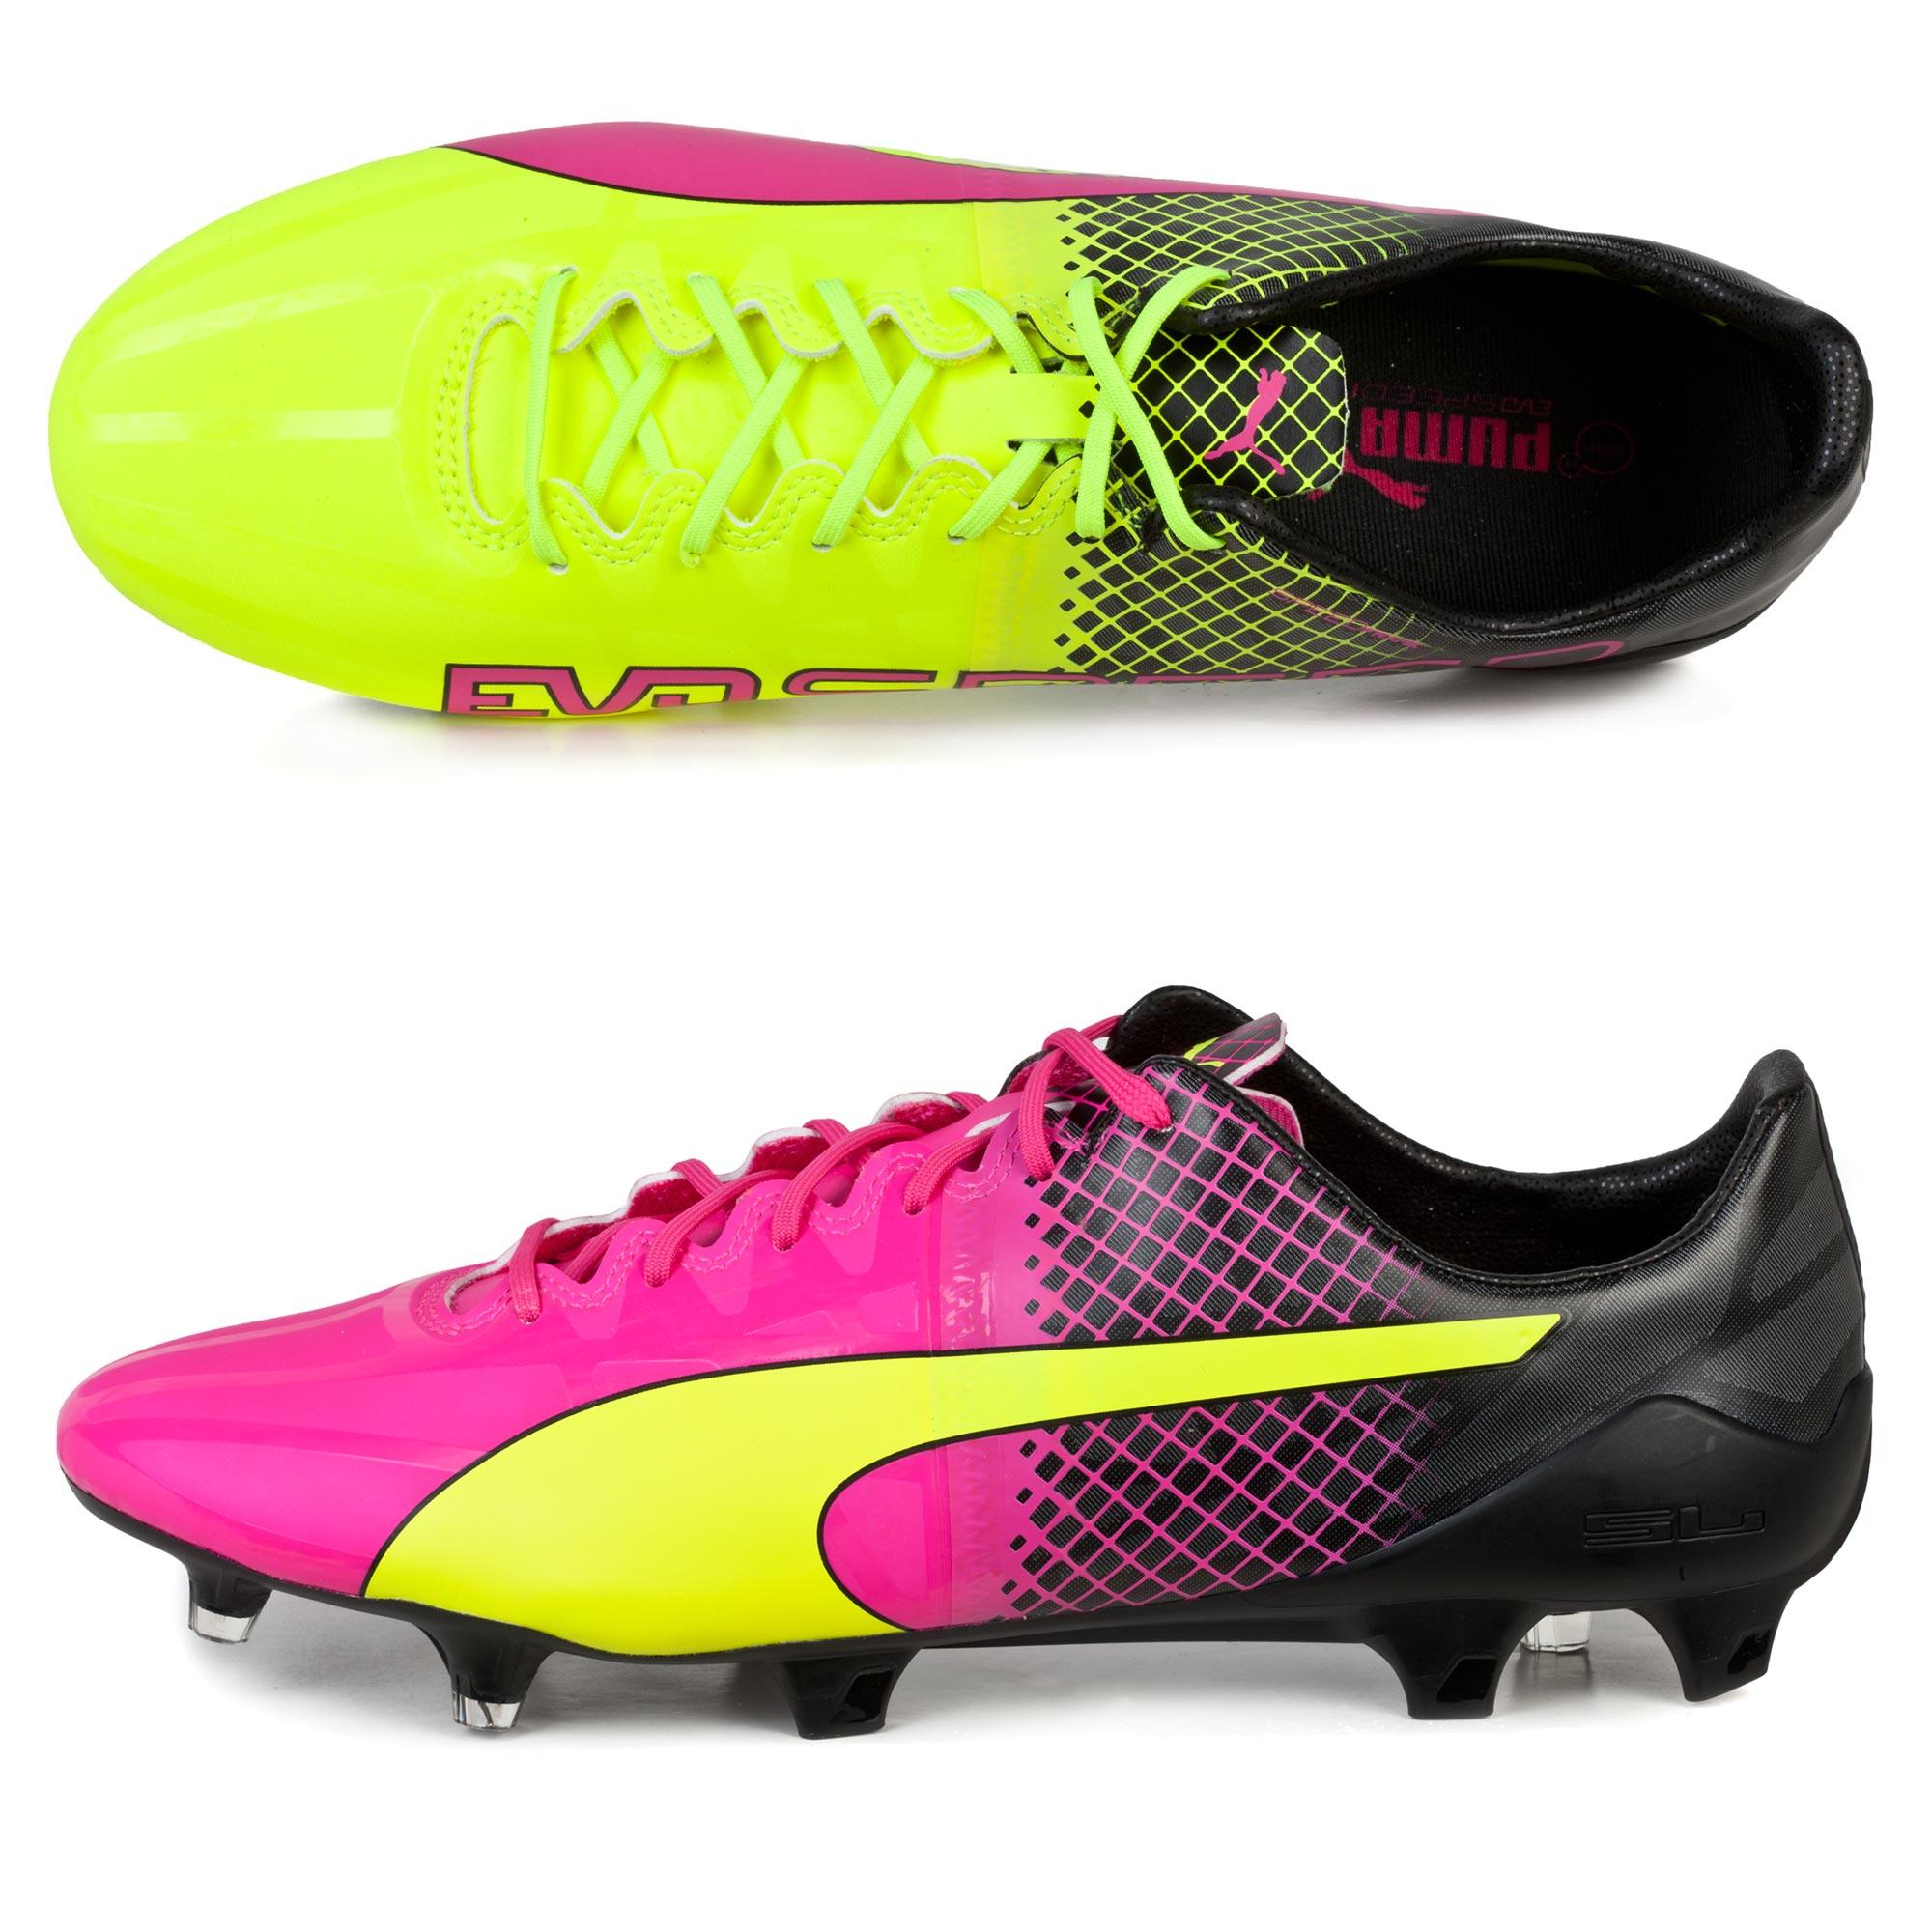 Puma evoSPEED 1.5 Tricks FG Pink